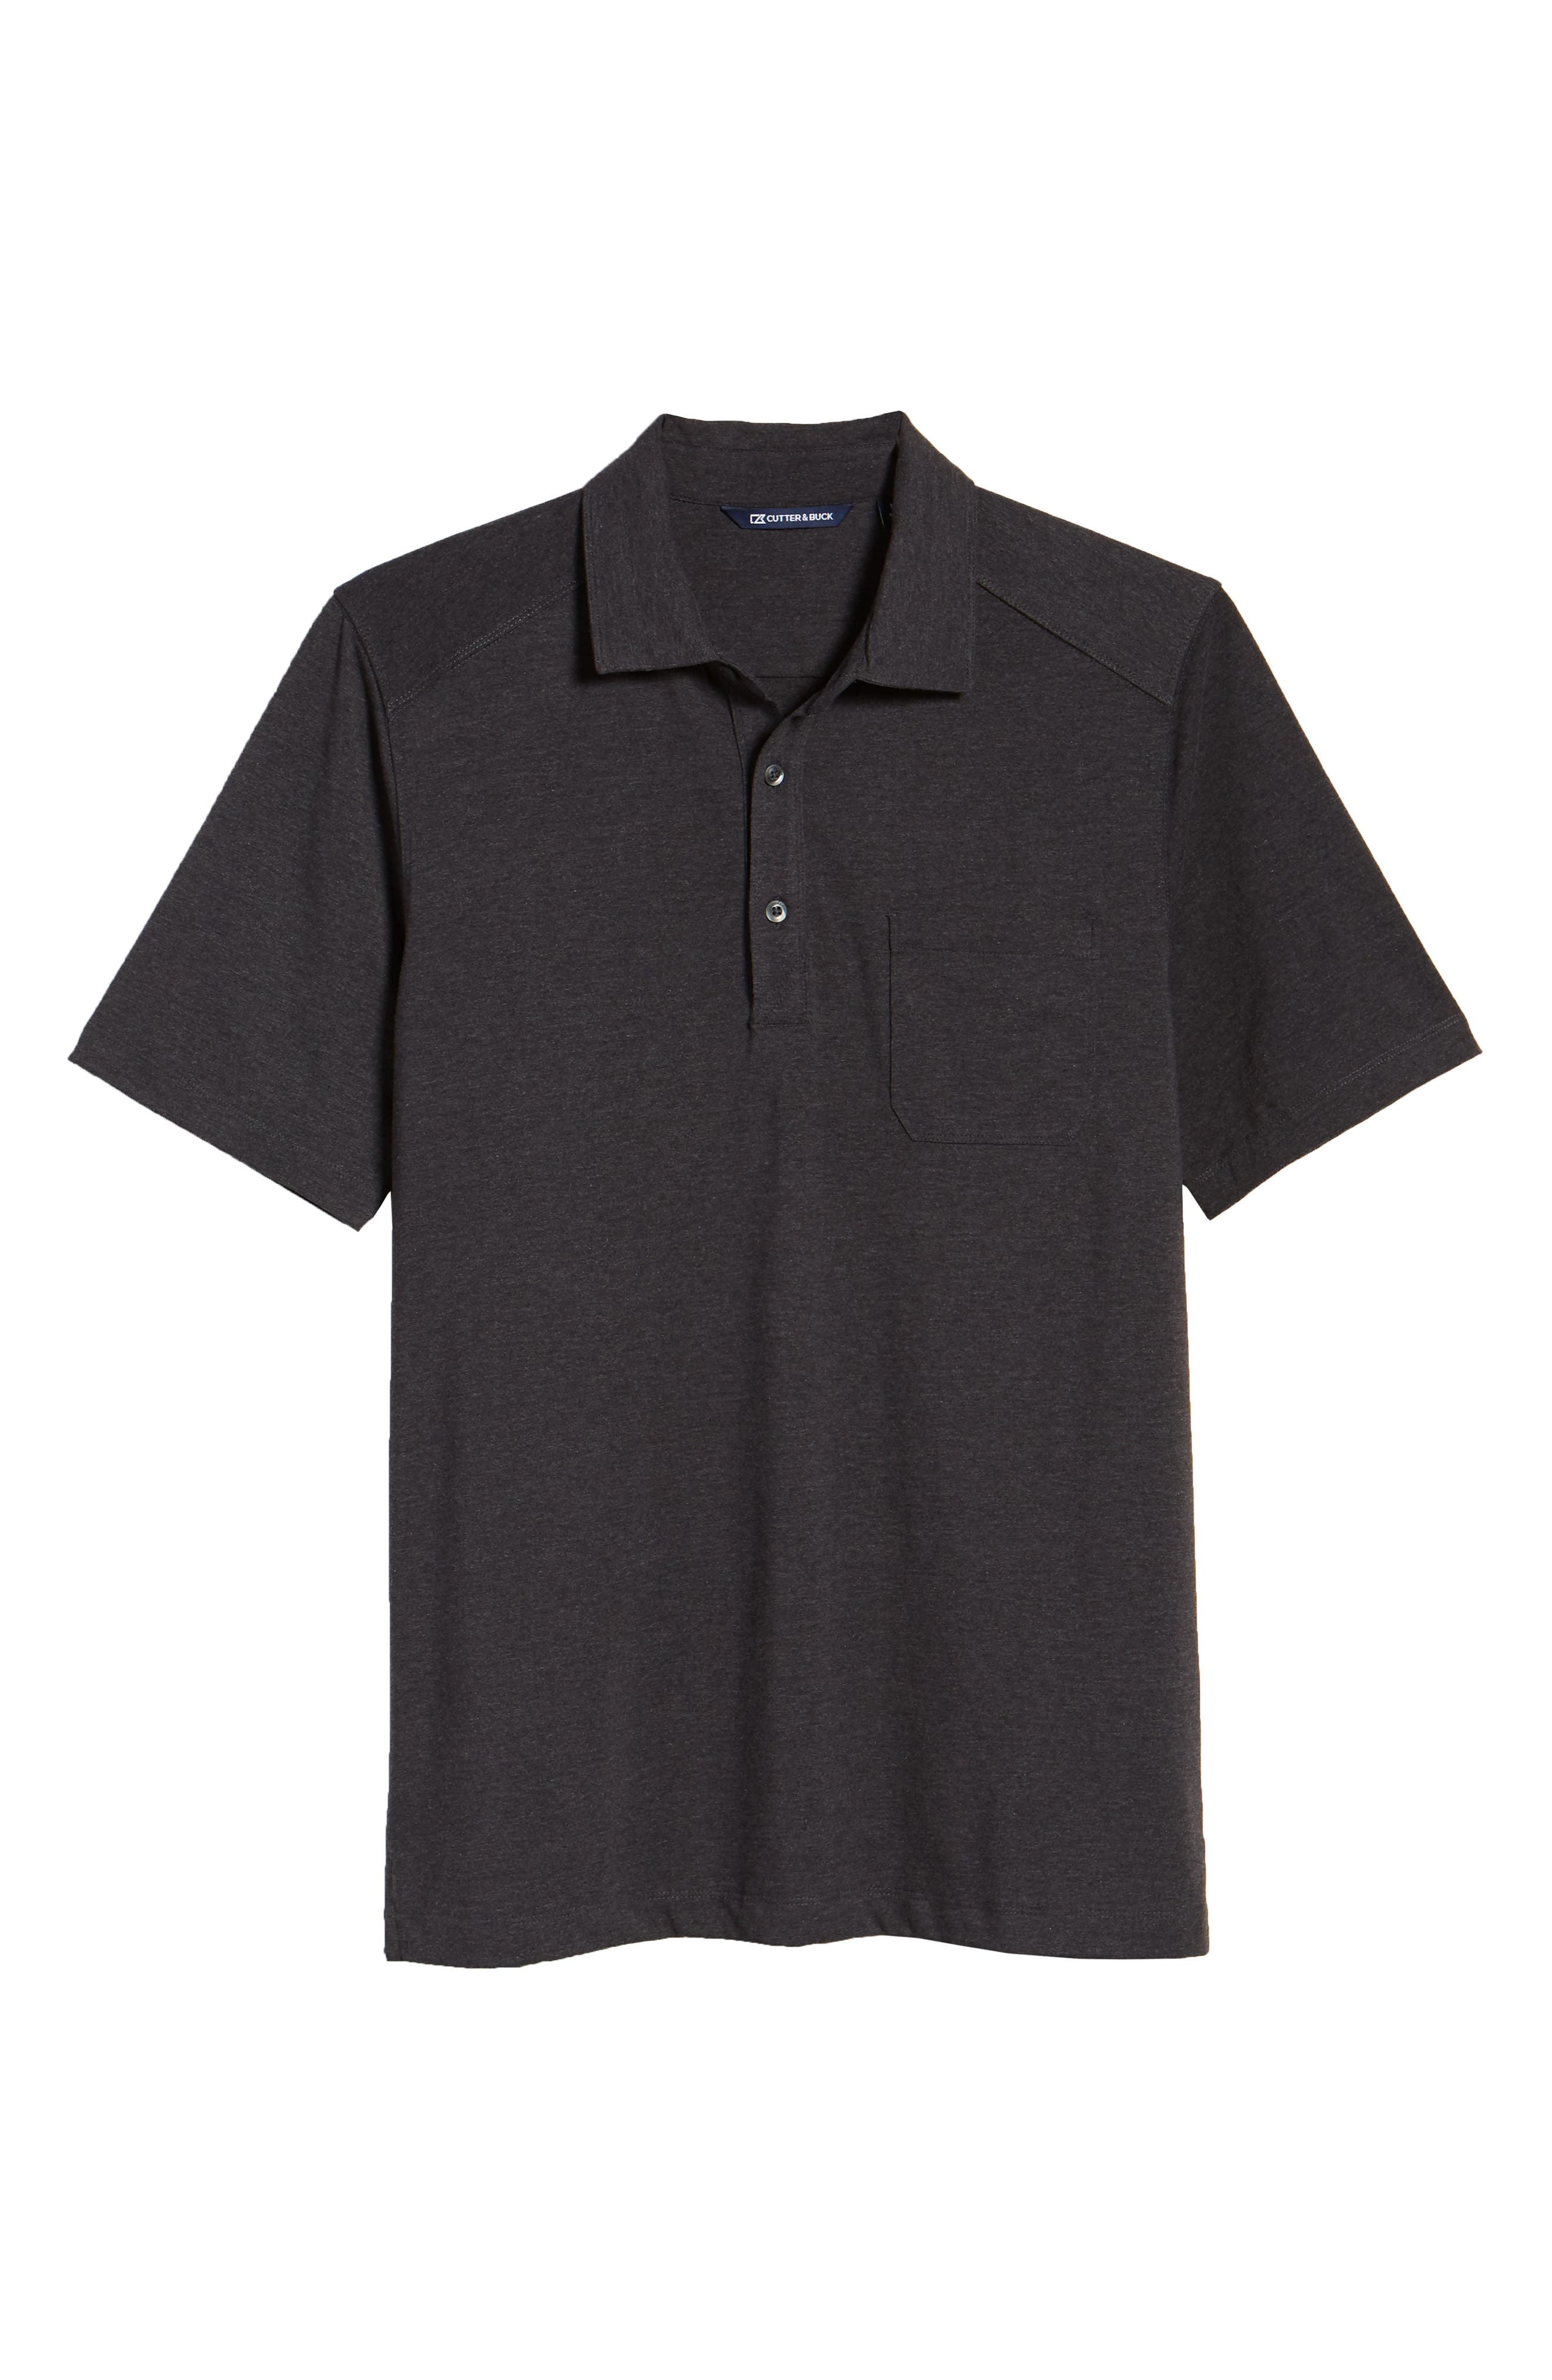 Advantage Drytec Jersey Polo